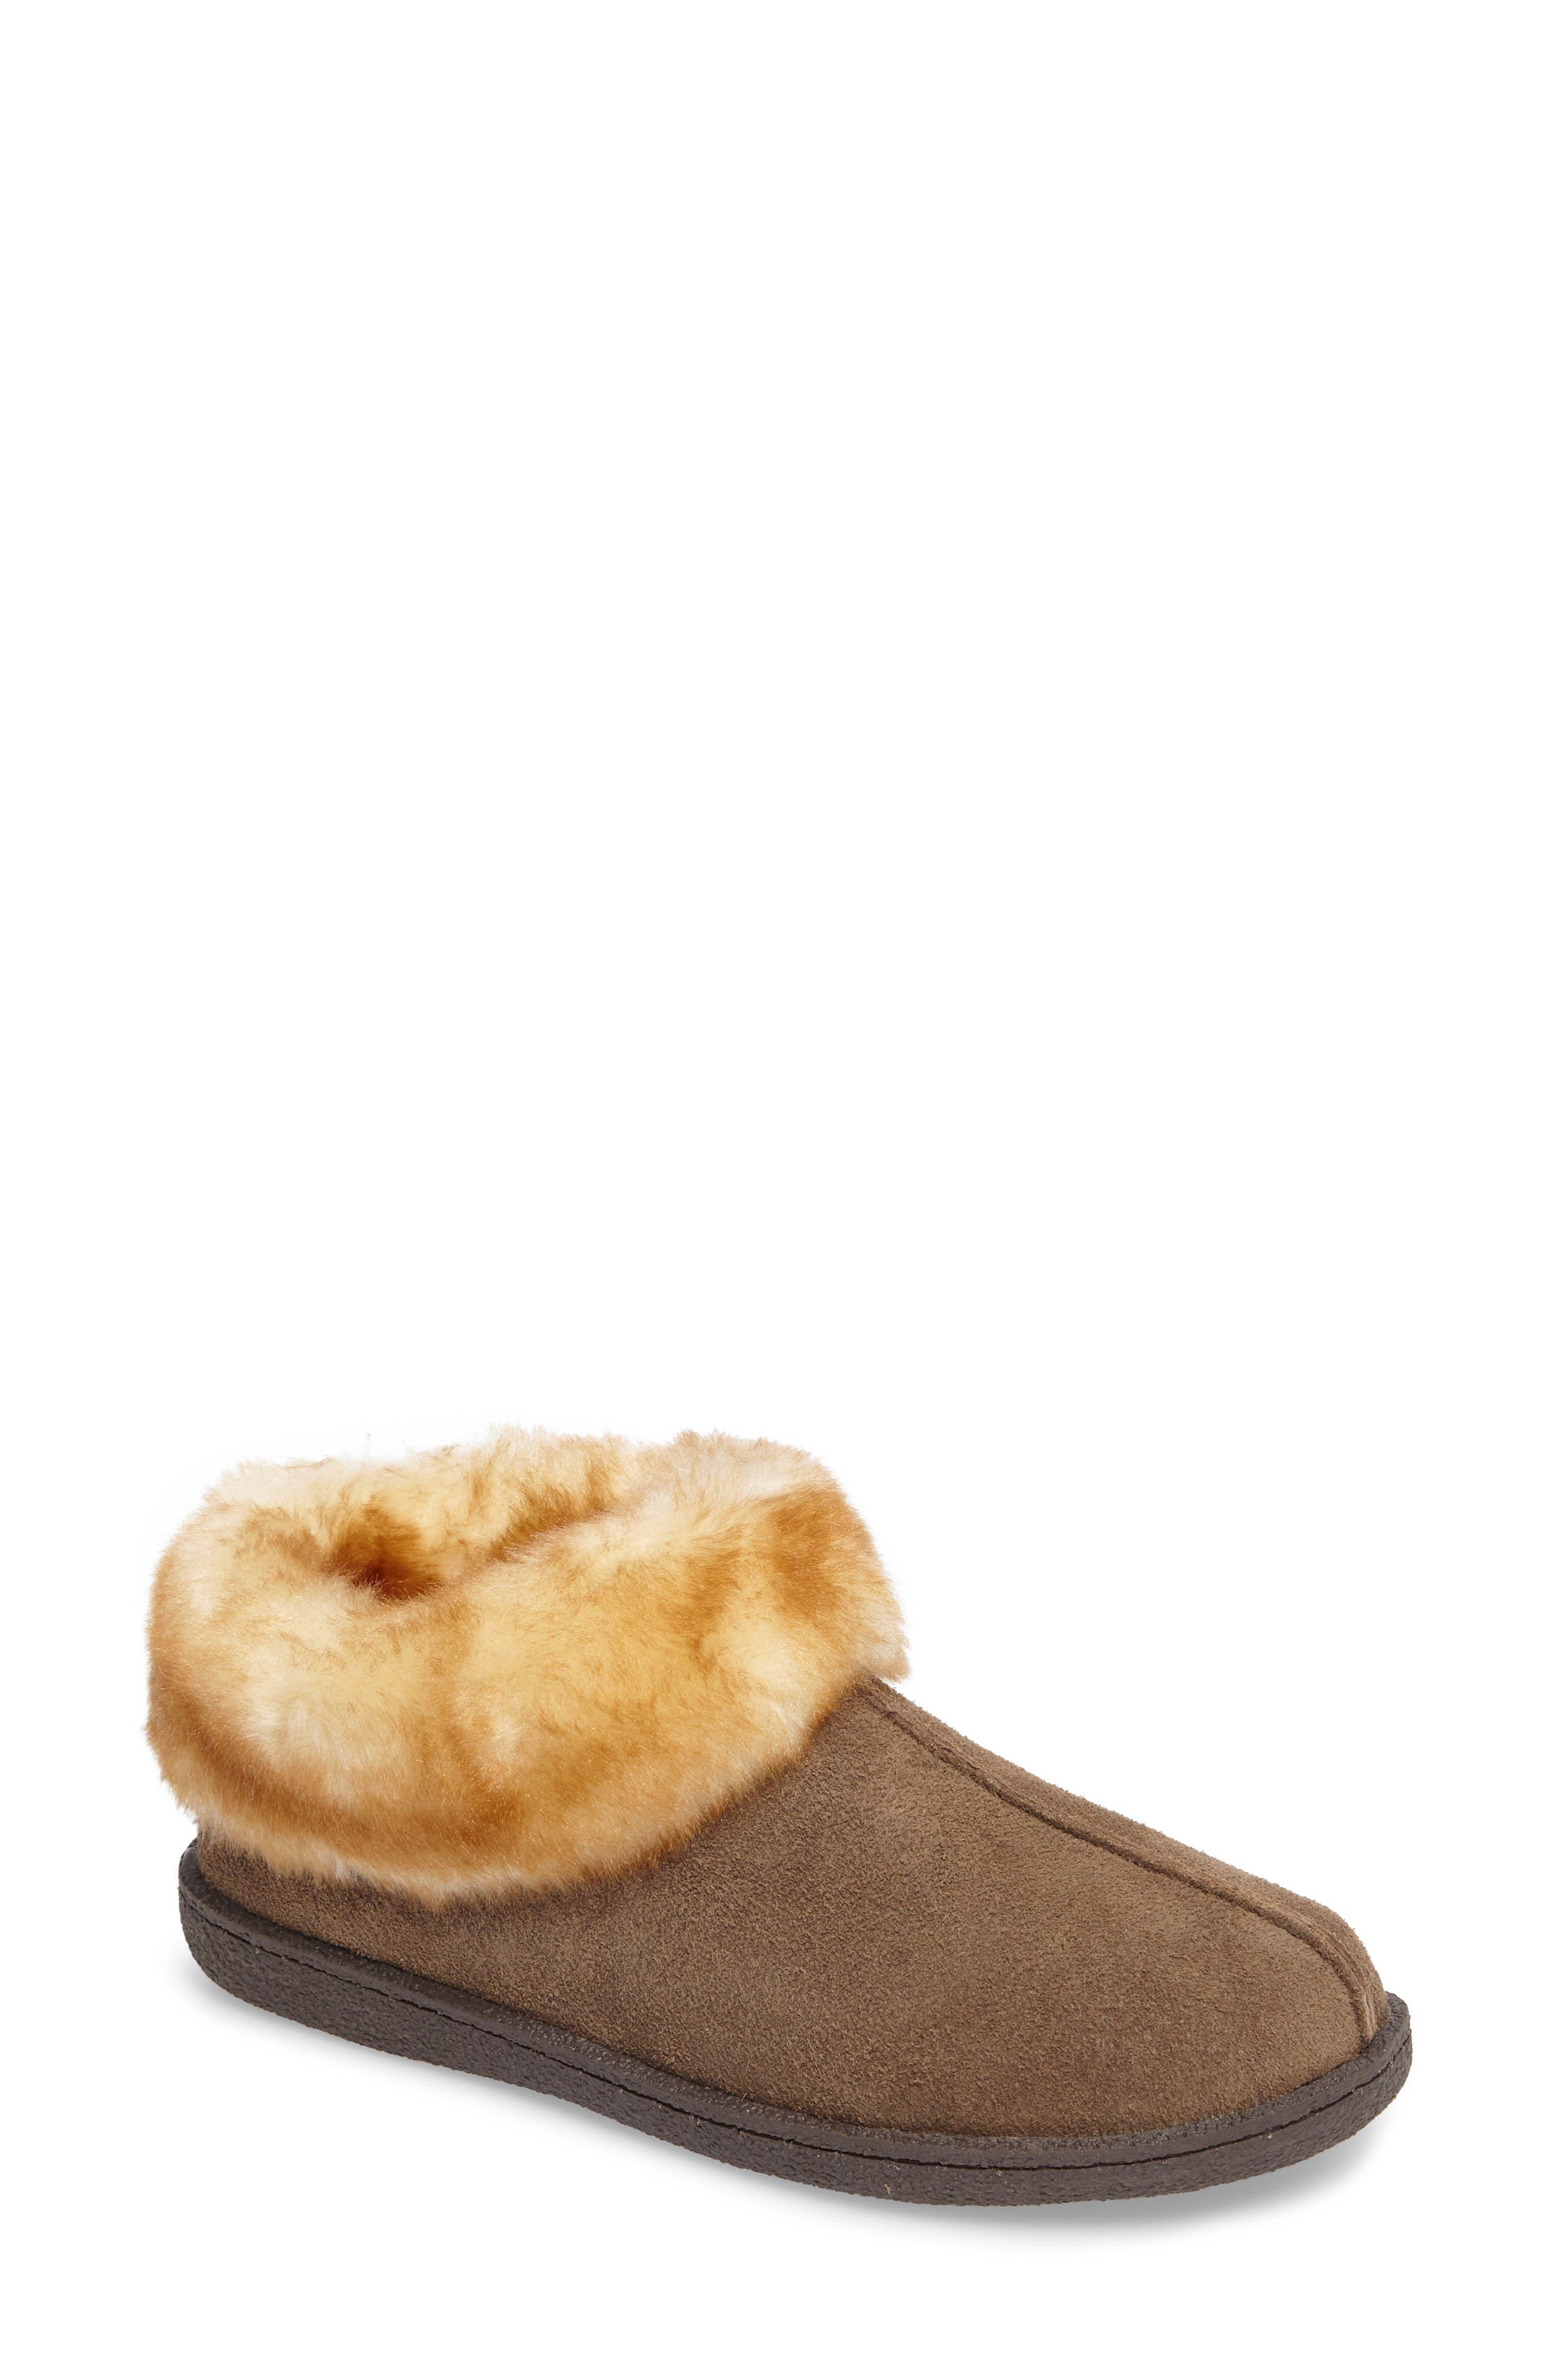 Autumn Ridge II Faux Fur Slipper Bootie,                         Main,                         color, Walnut Suede